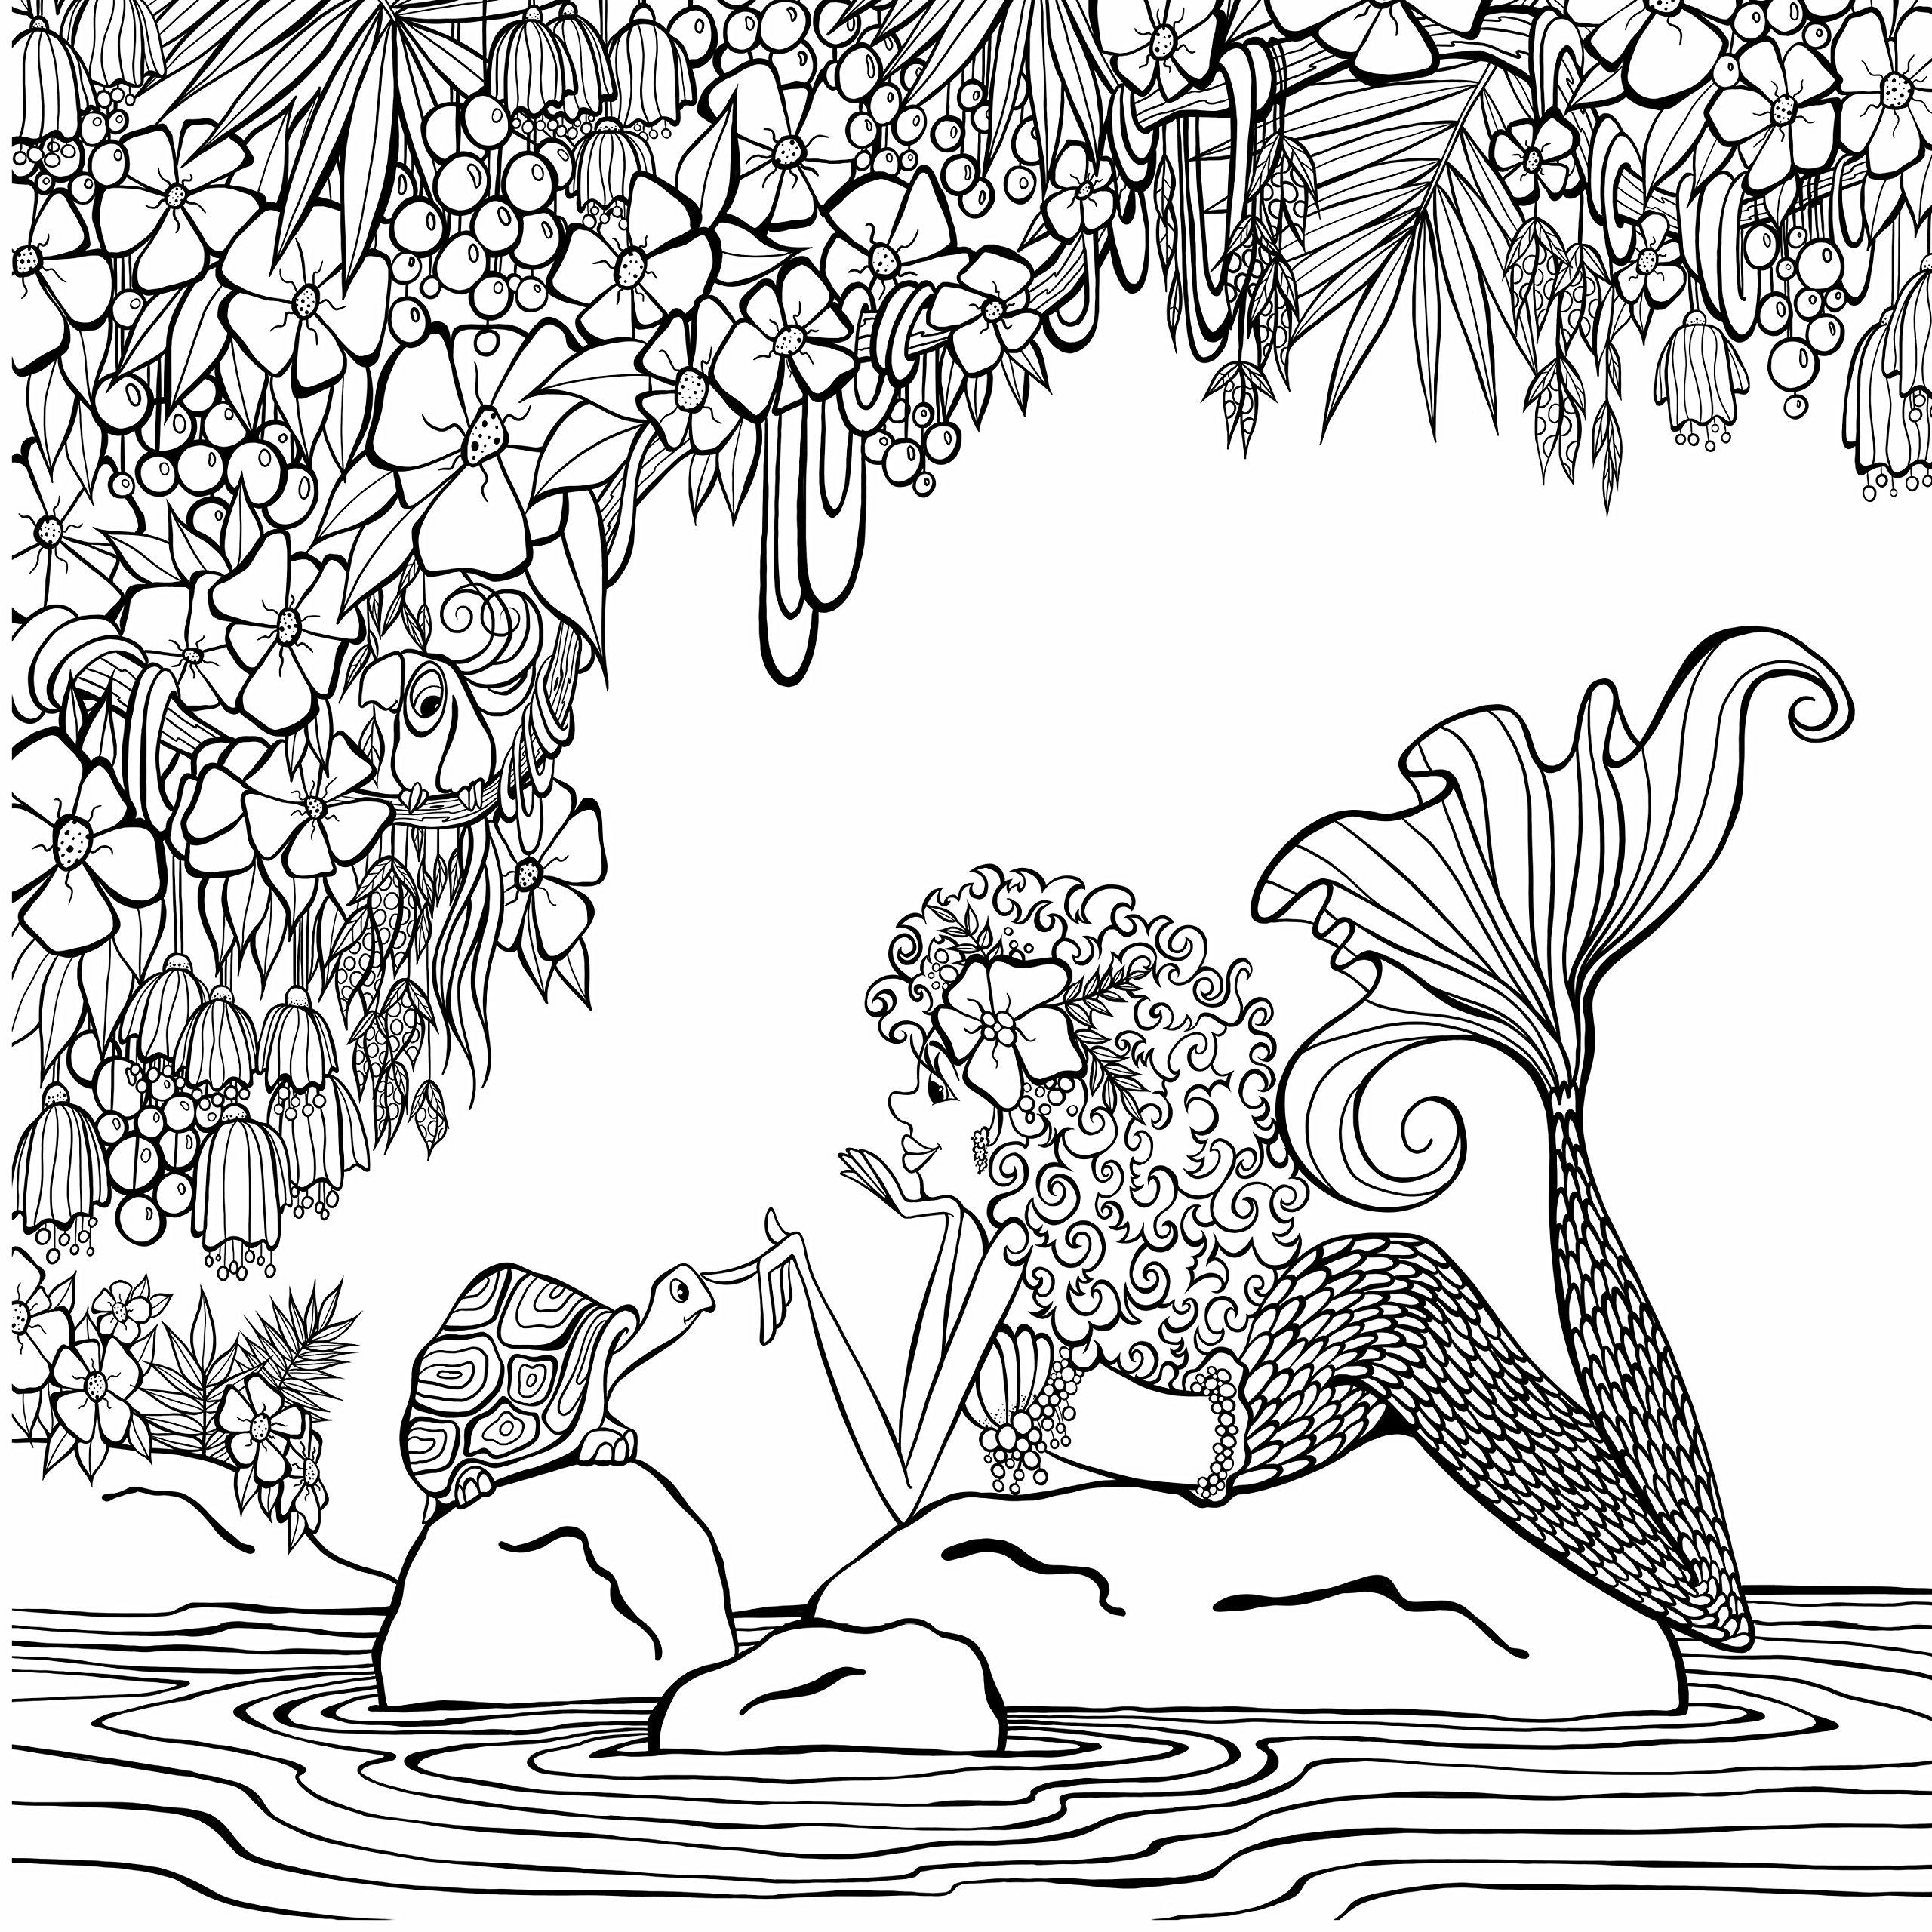 2560x2560 Zendoodle Coloring Presents Mermaids In Paradise